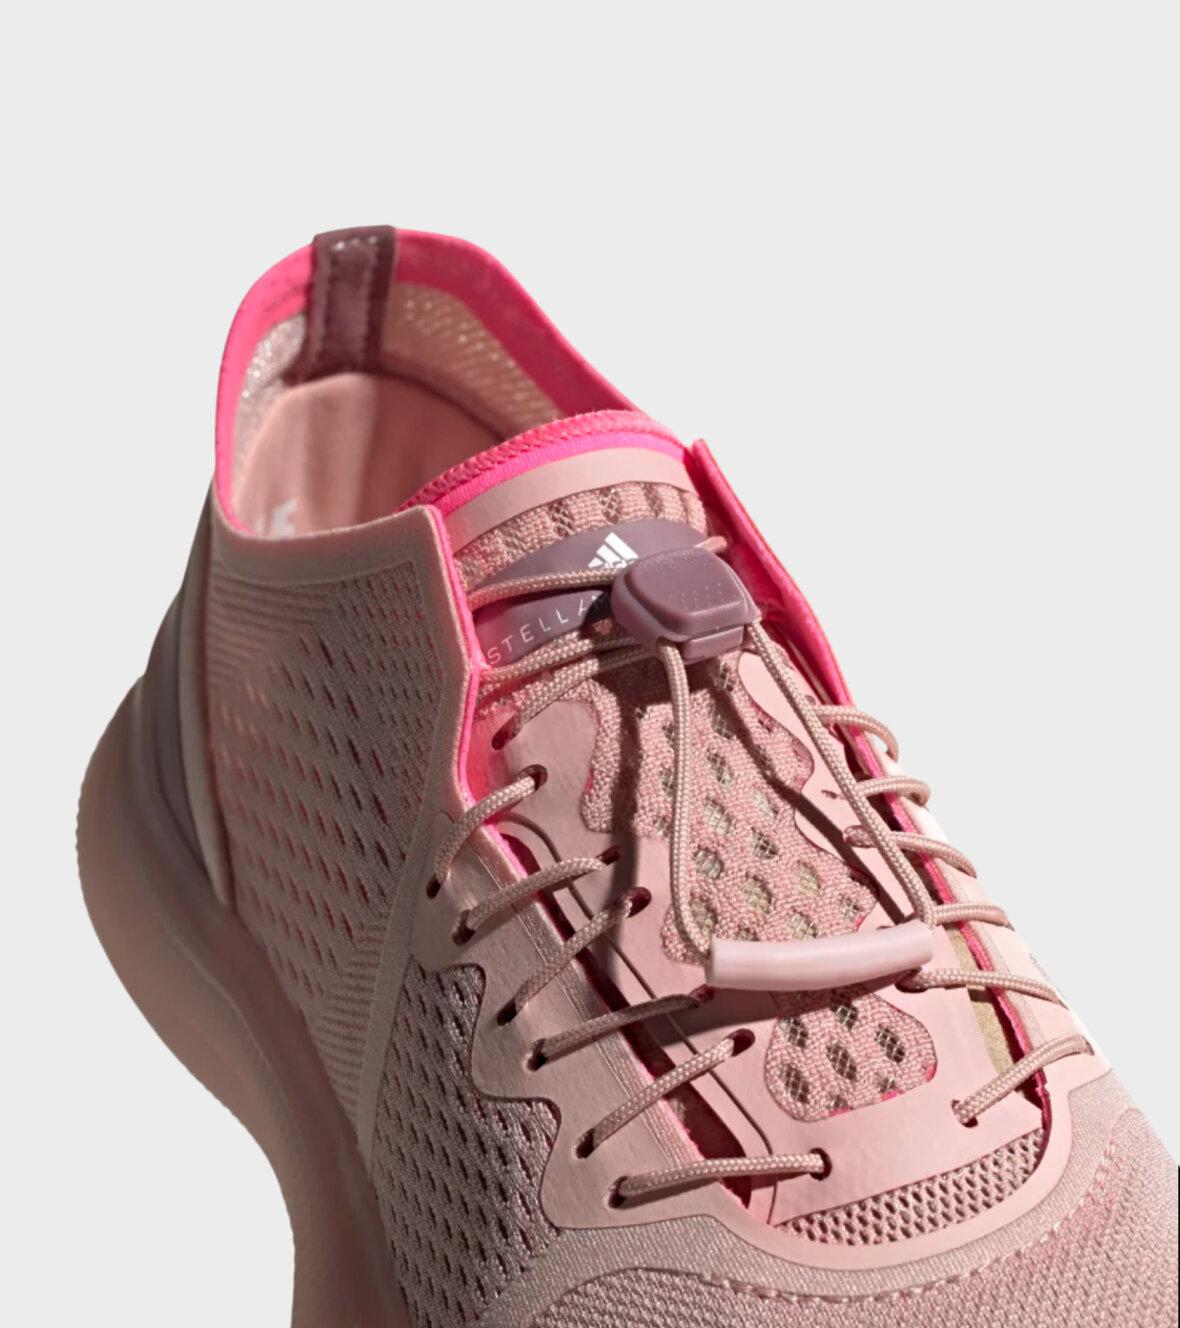 adidas By Stella McCartney Pureboost Trainer Sneakers in